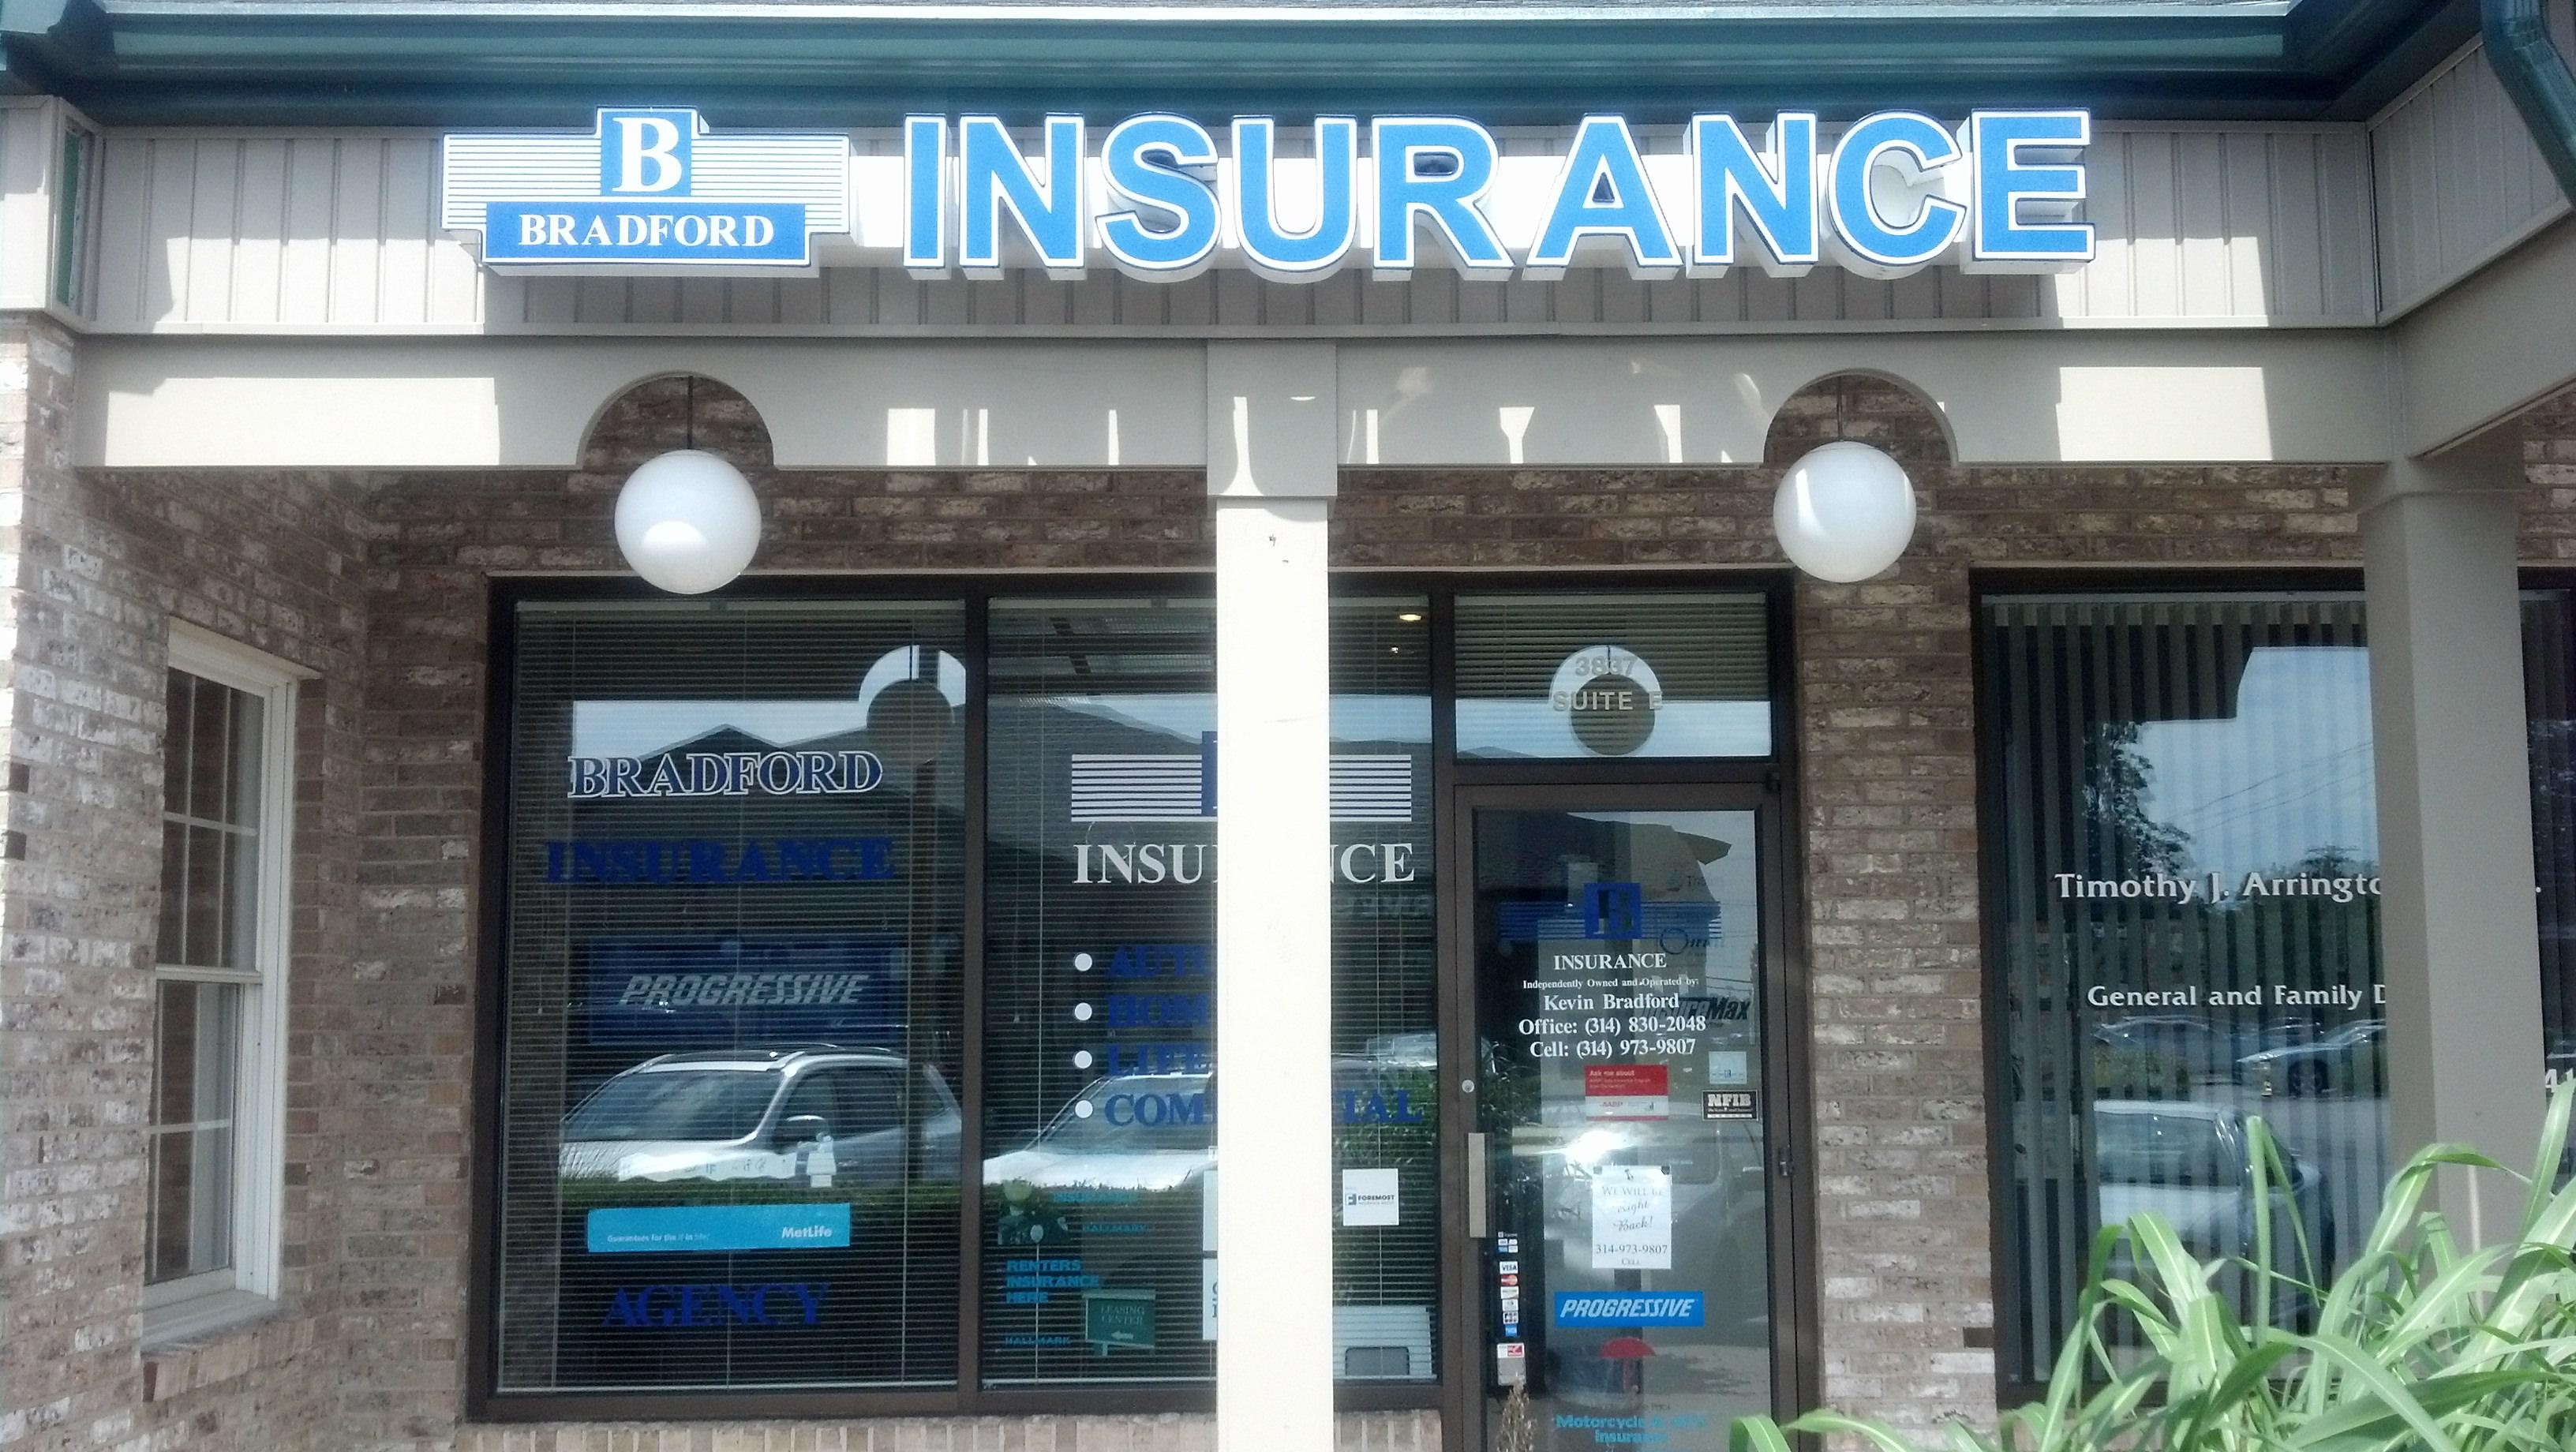 Bradford Insurance Agency LLC image 1